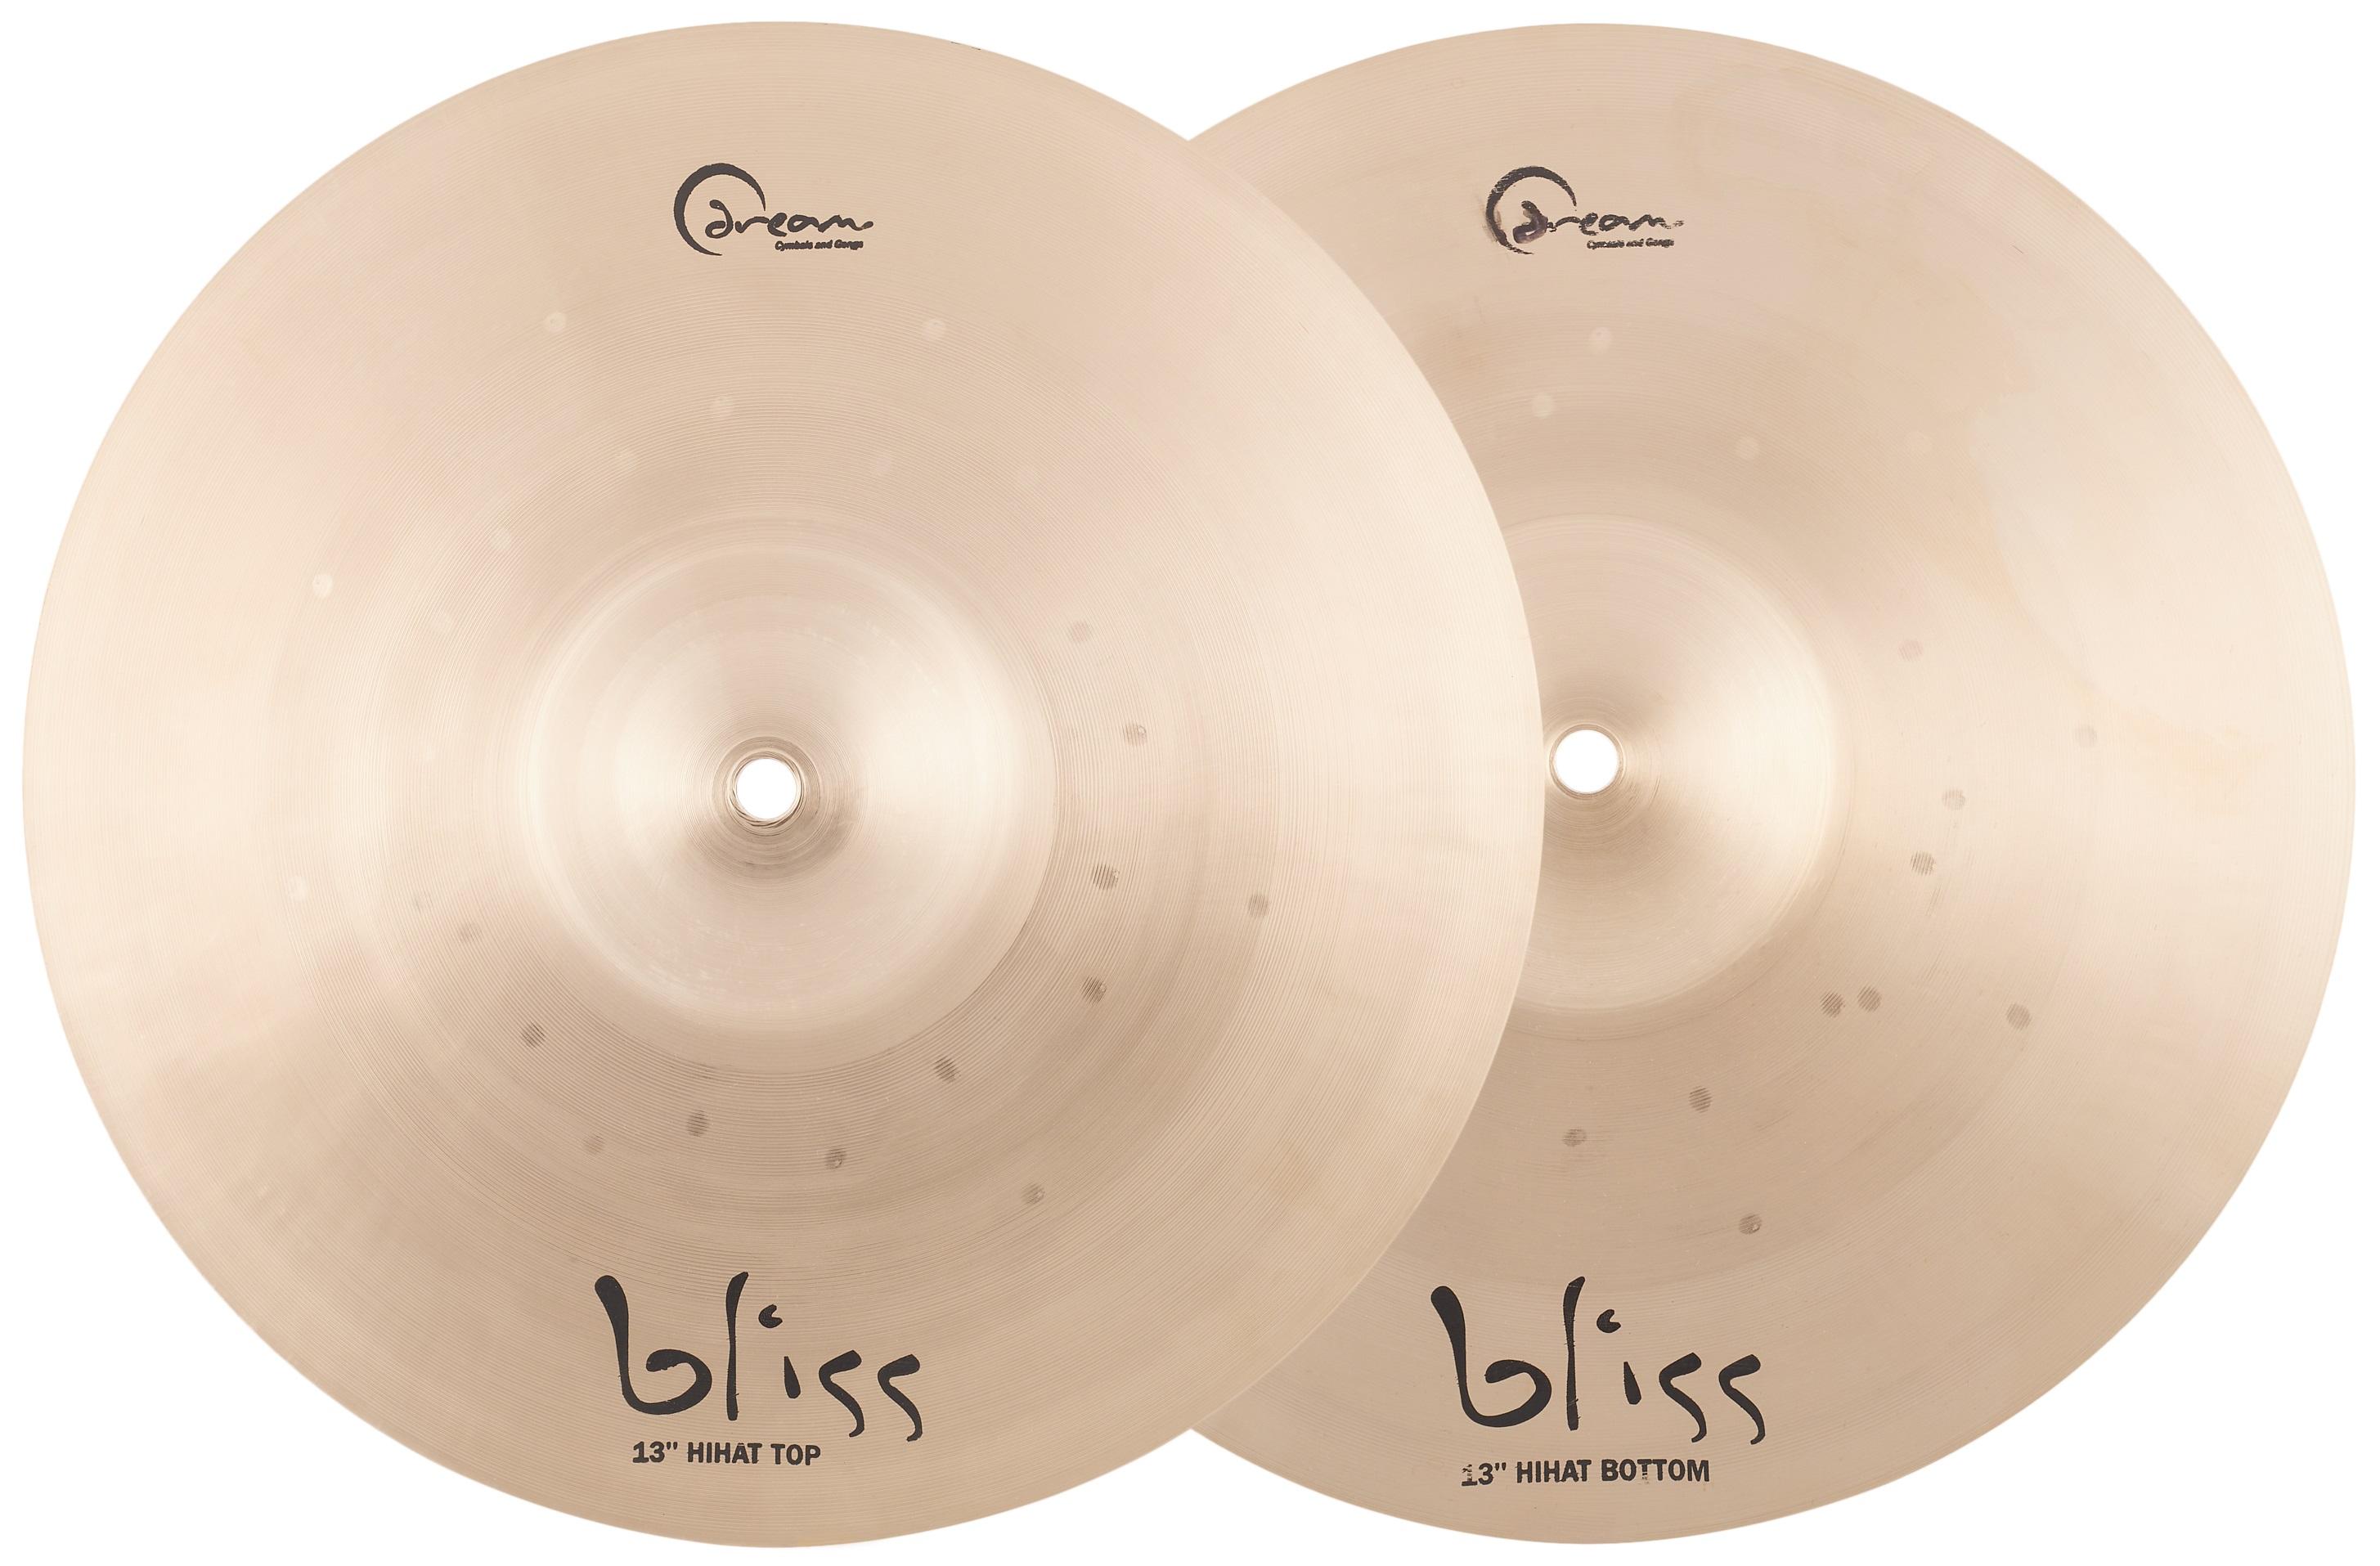 "Dream 13"" Bliss Series Hi Hat"